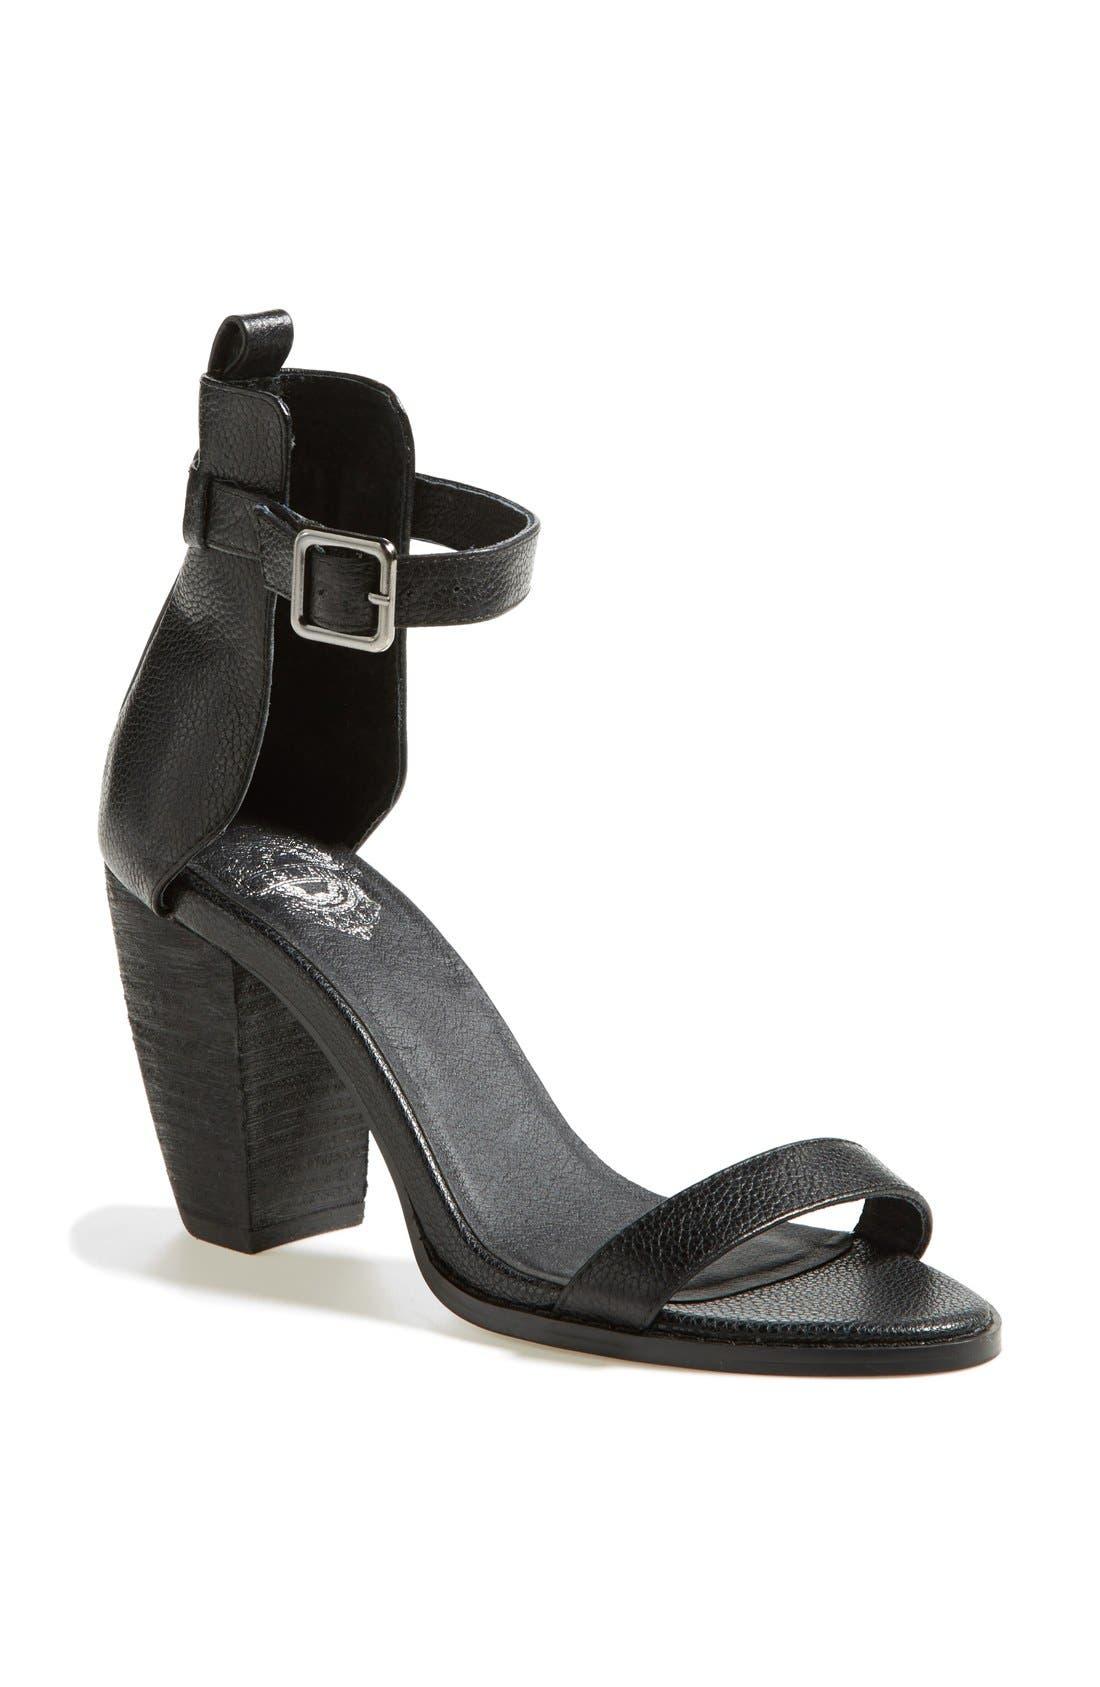 Main Image - Sol Sana 'Tally' Sandal